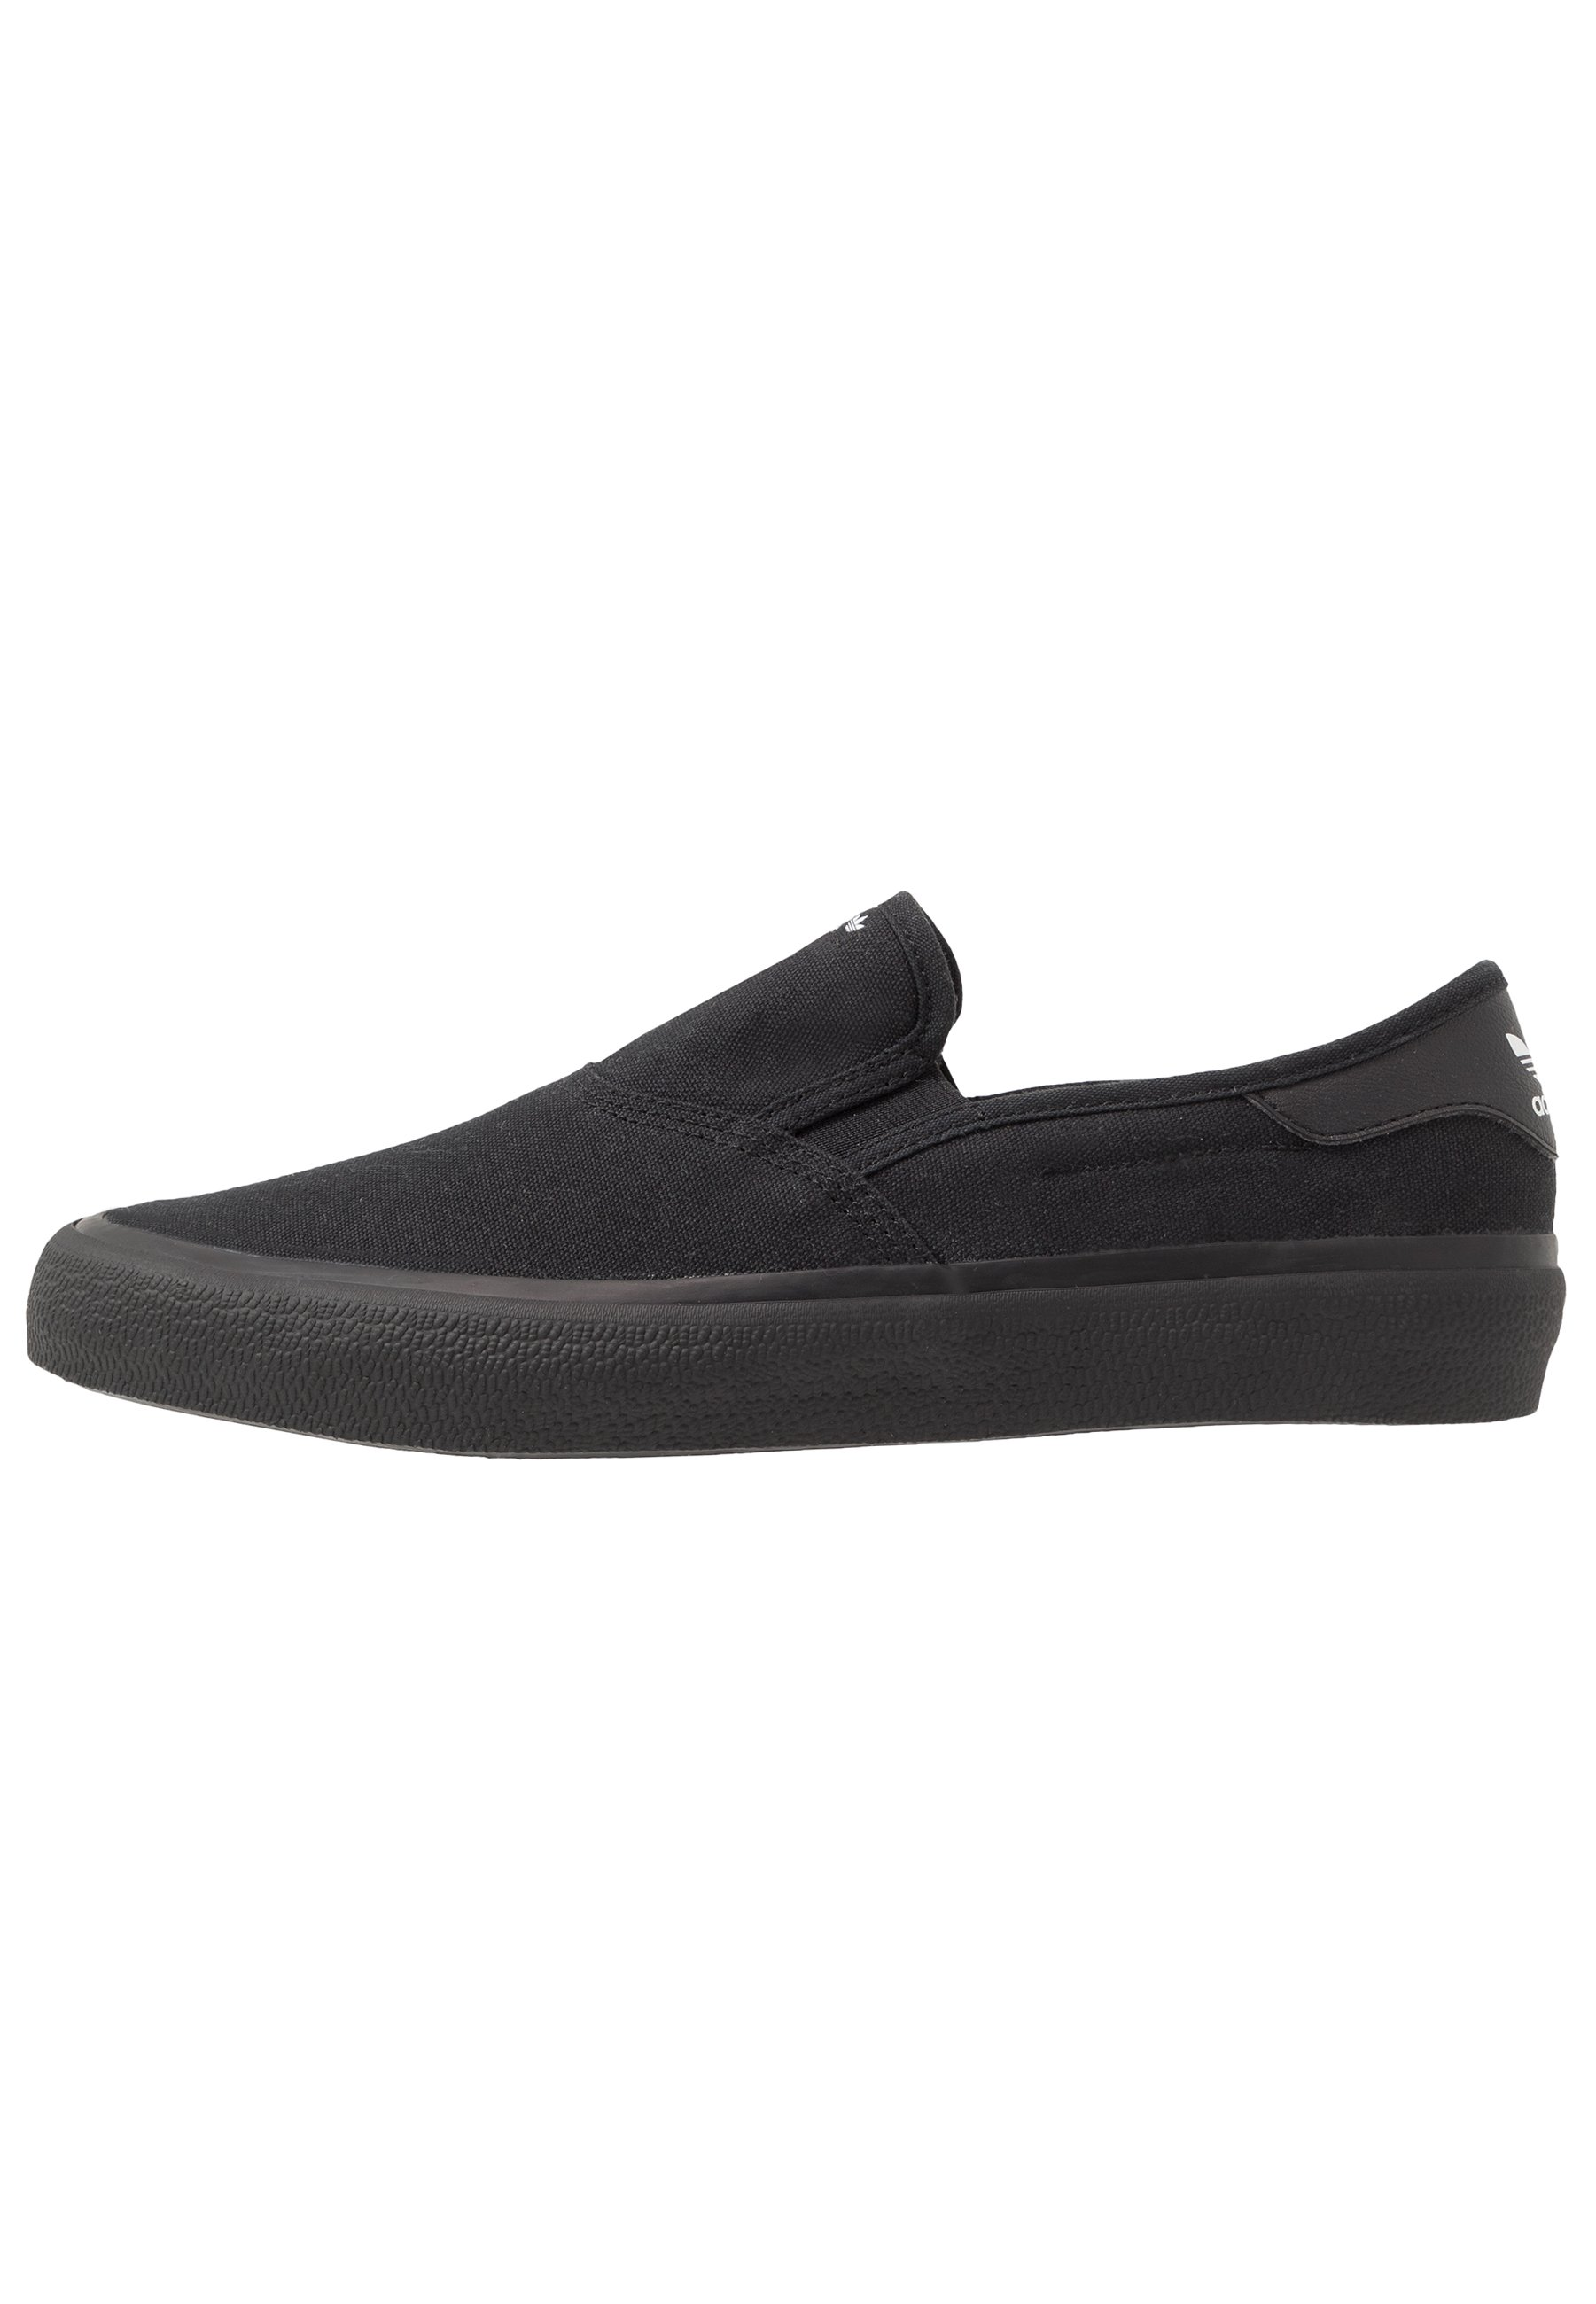 3MC Slip ins core blackfootwear white